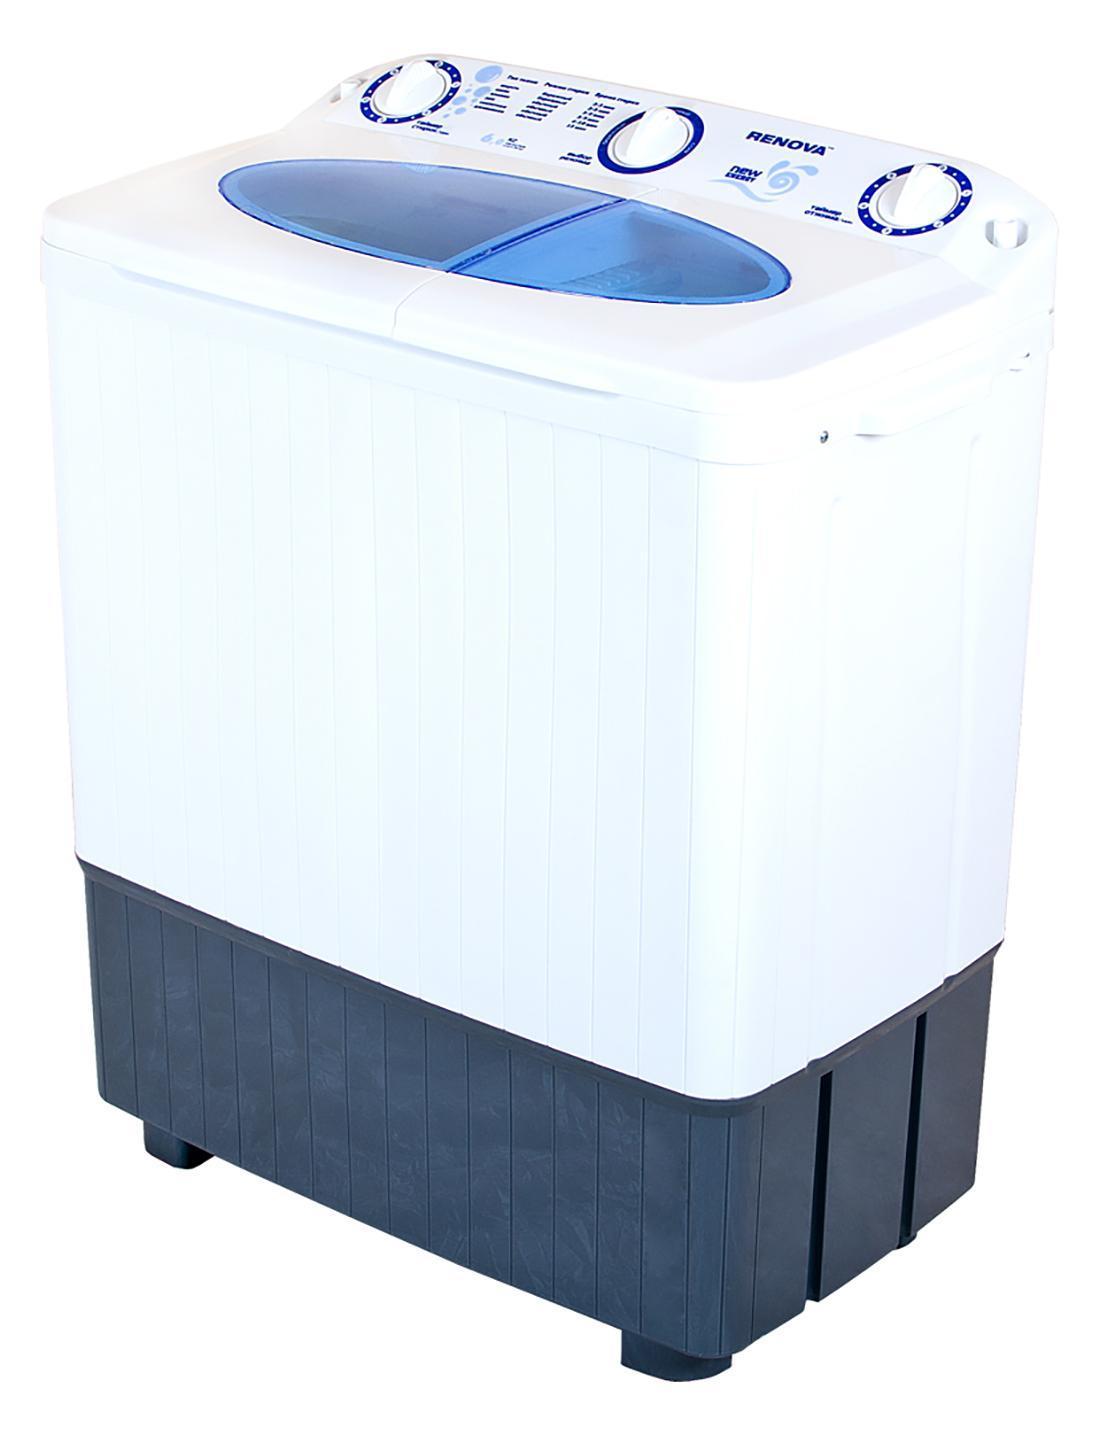 Renova WS-60PET стиральная машина стиральная настенная машина цена